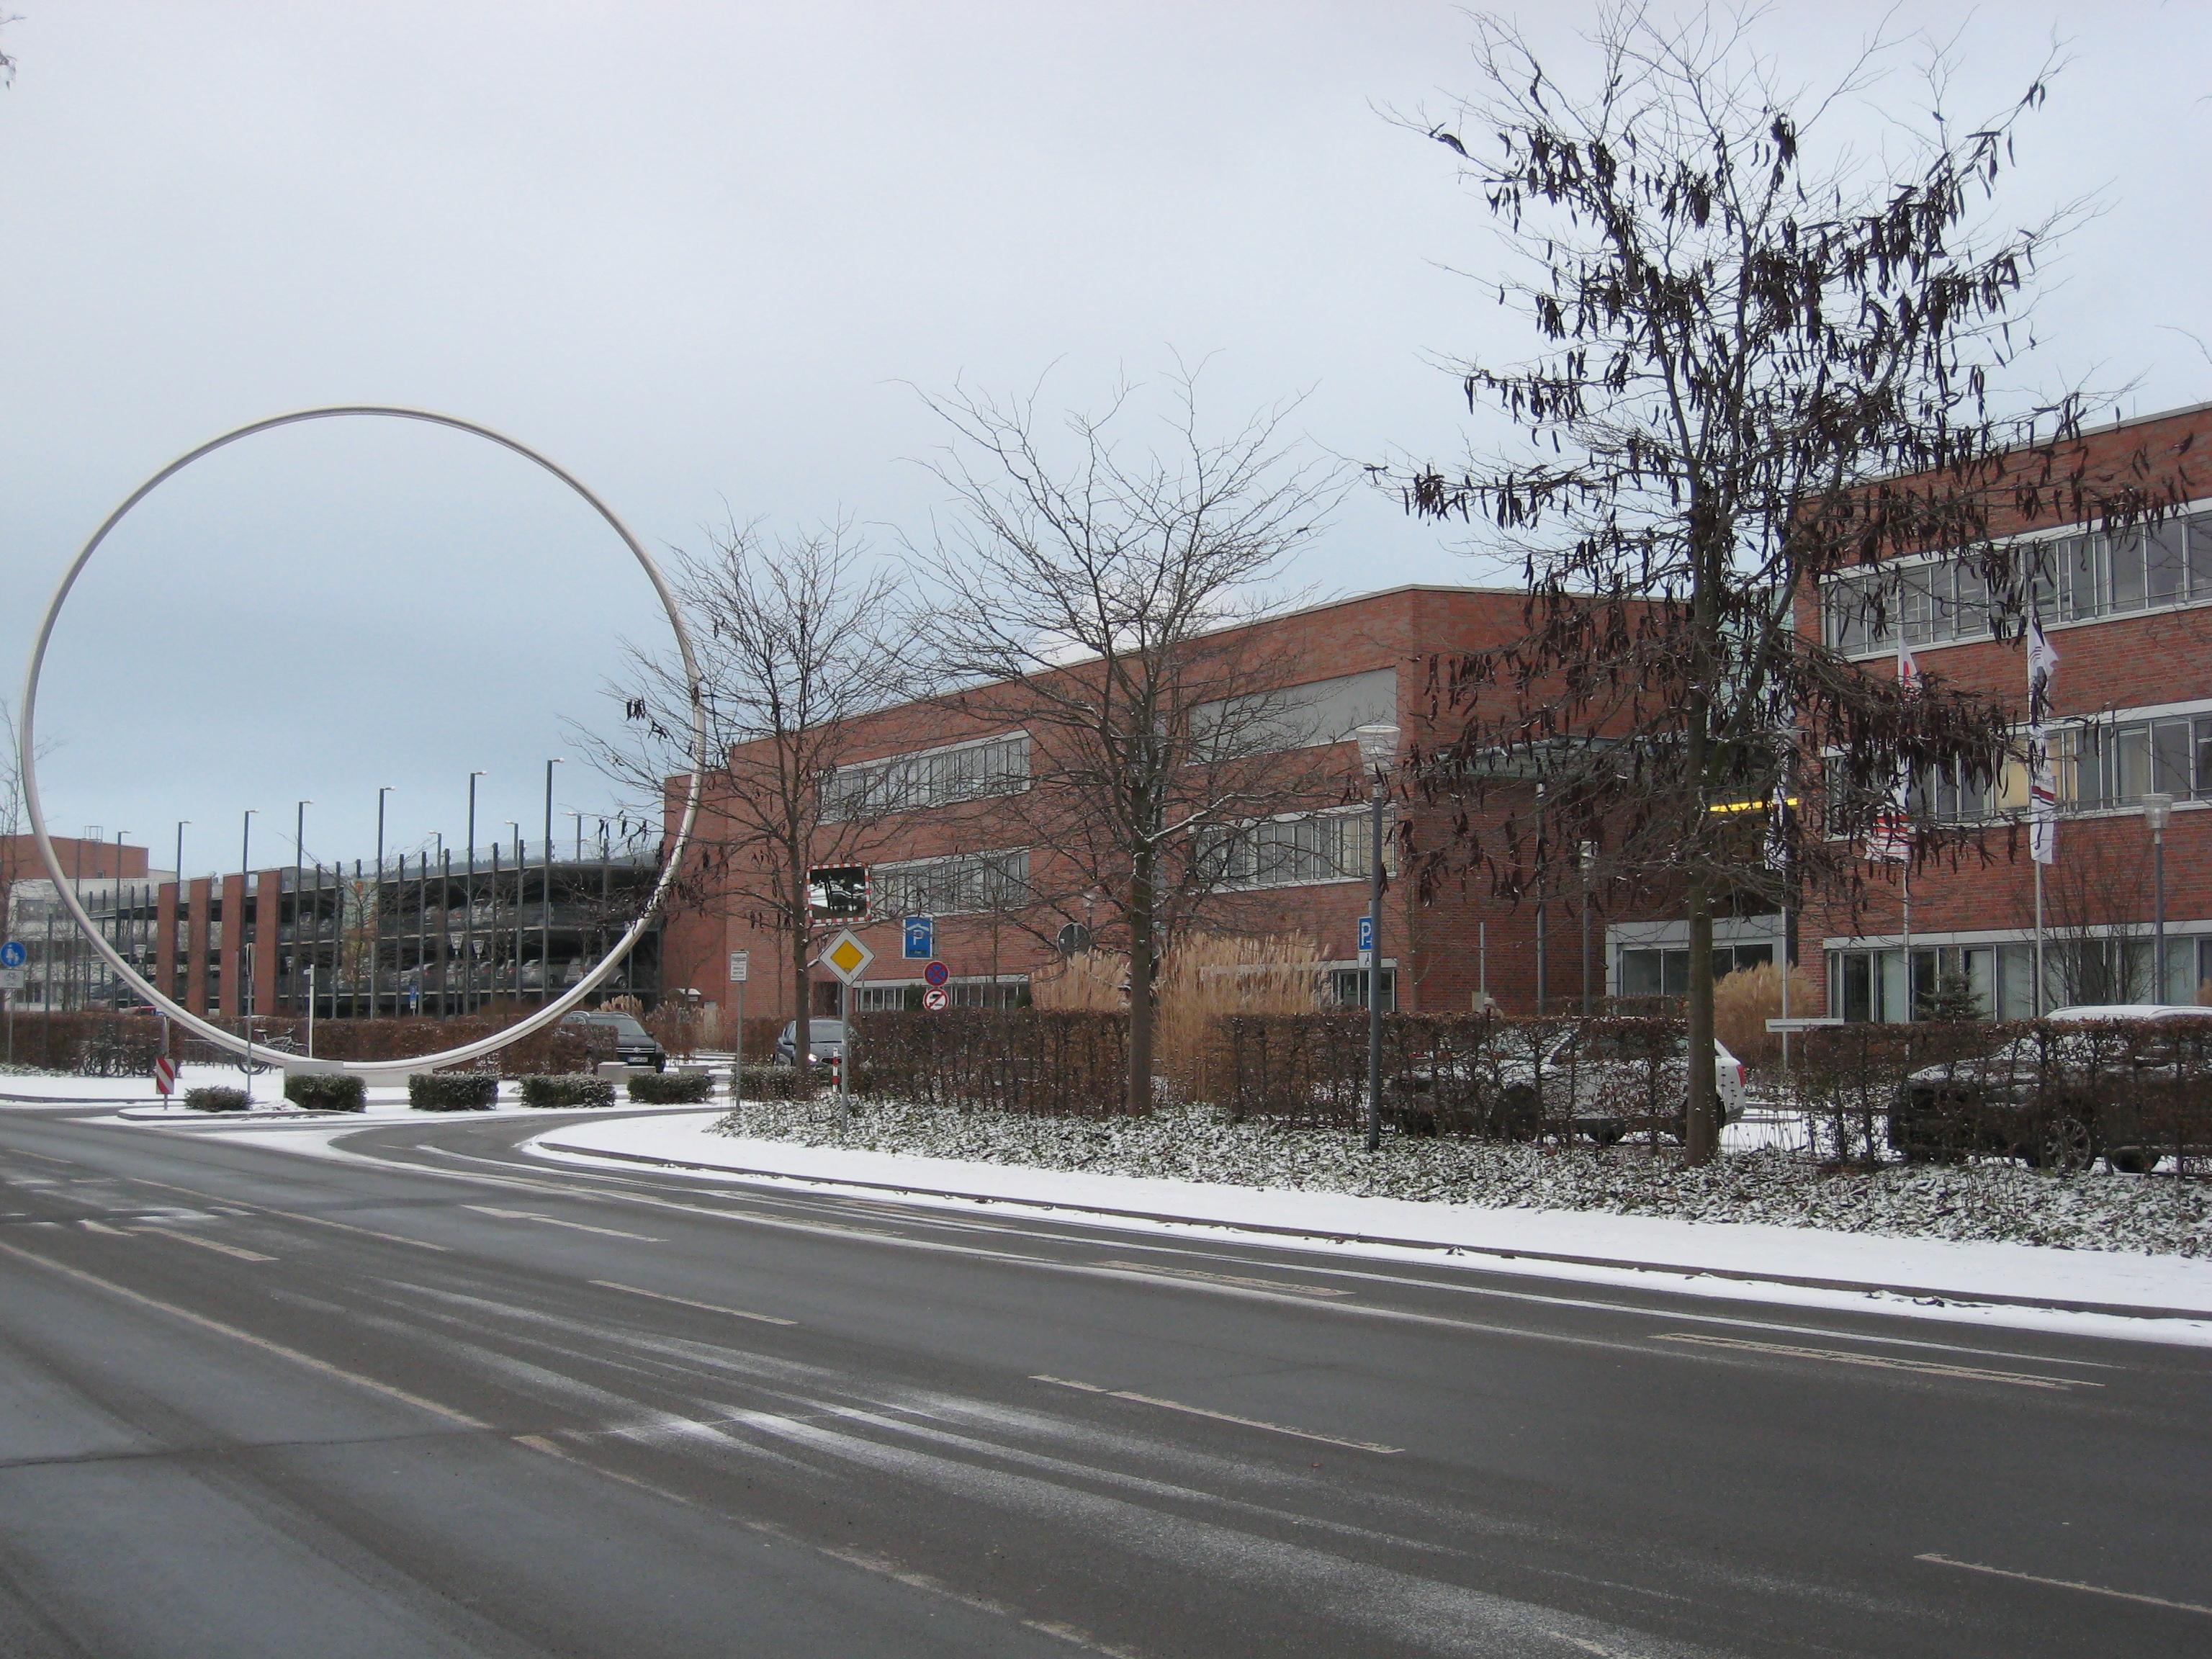 Johannesthal Klinikum Erfurt